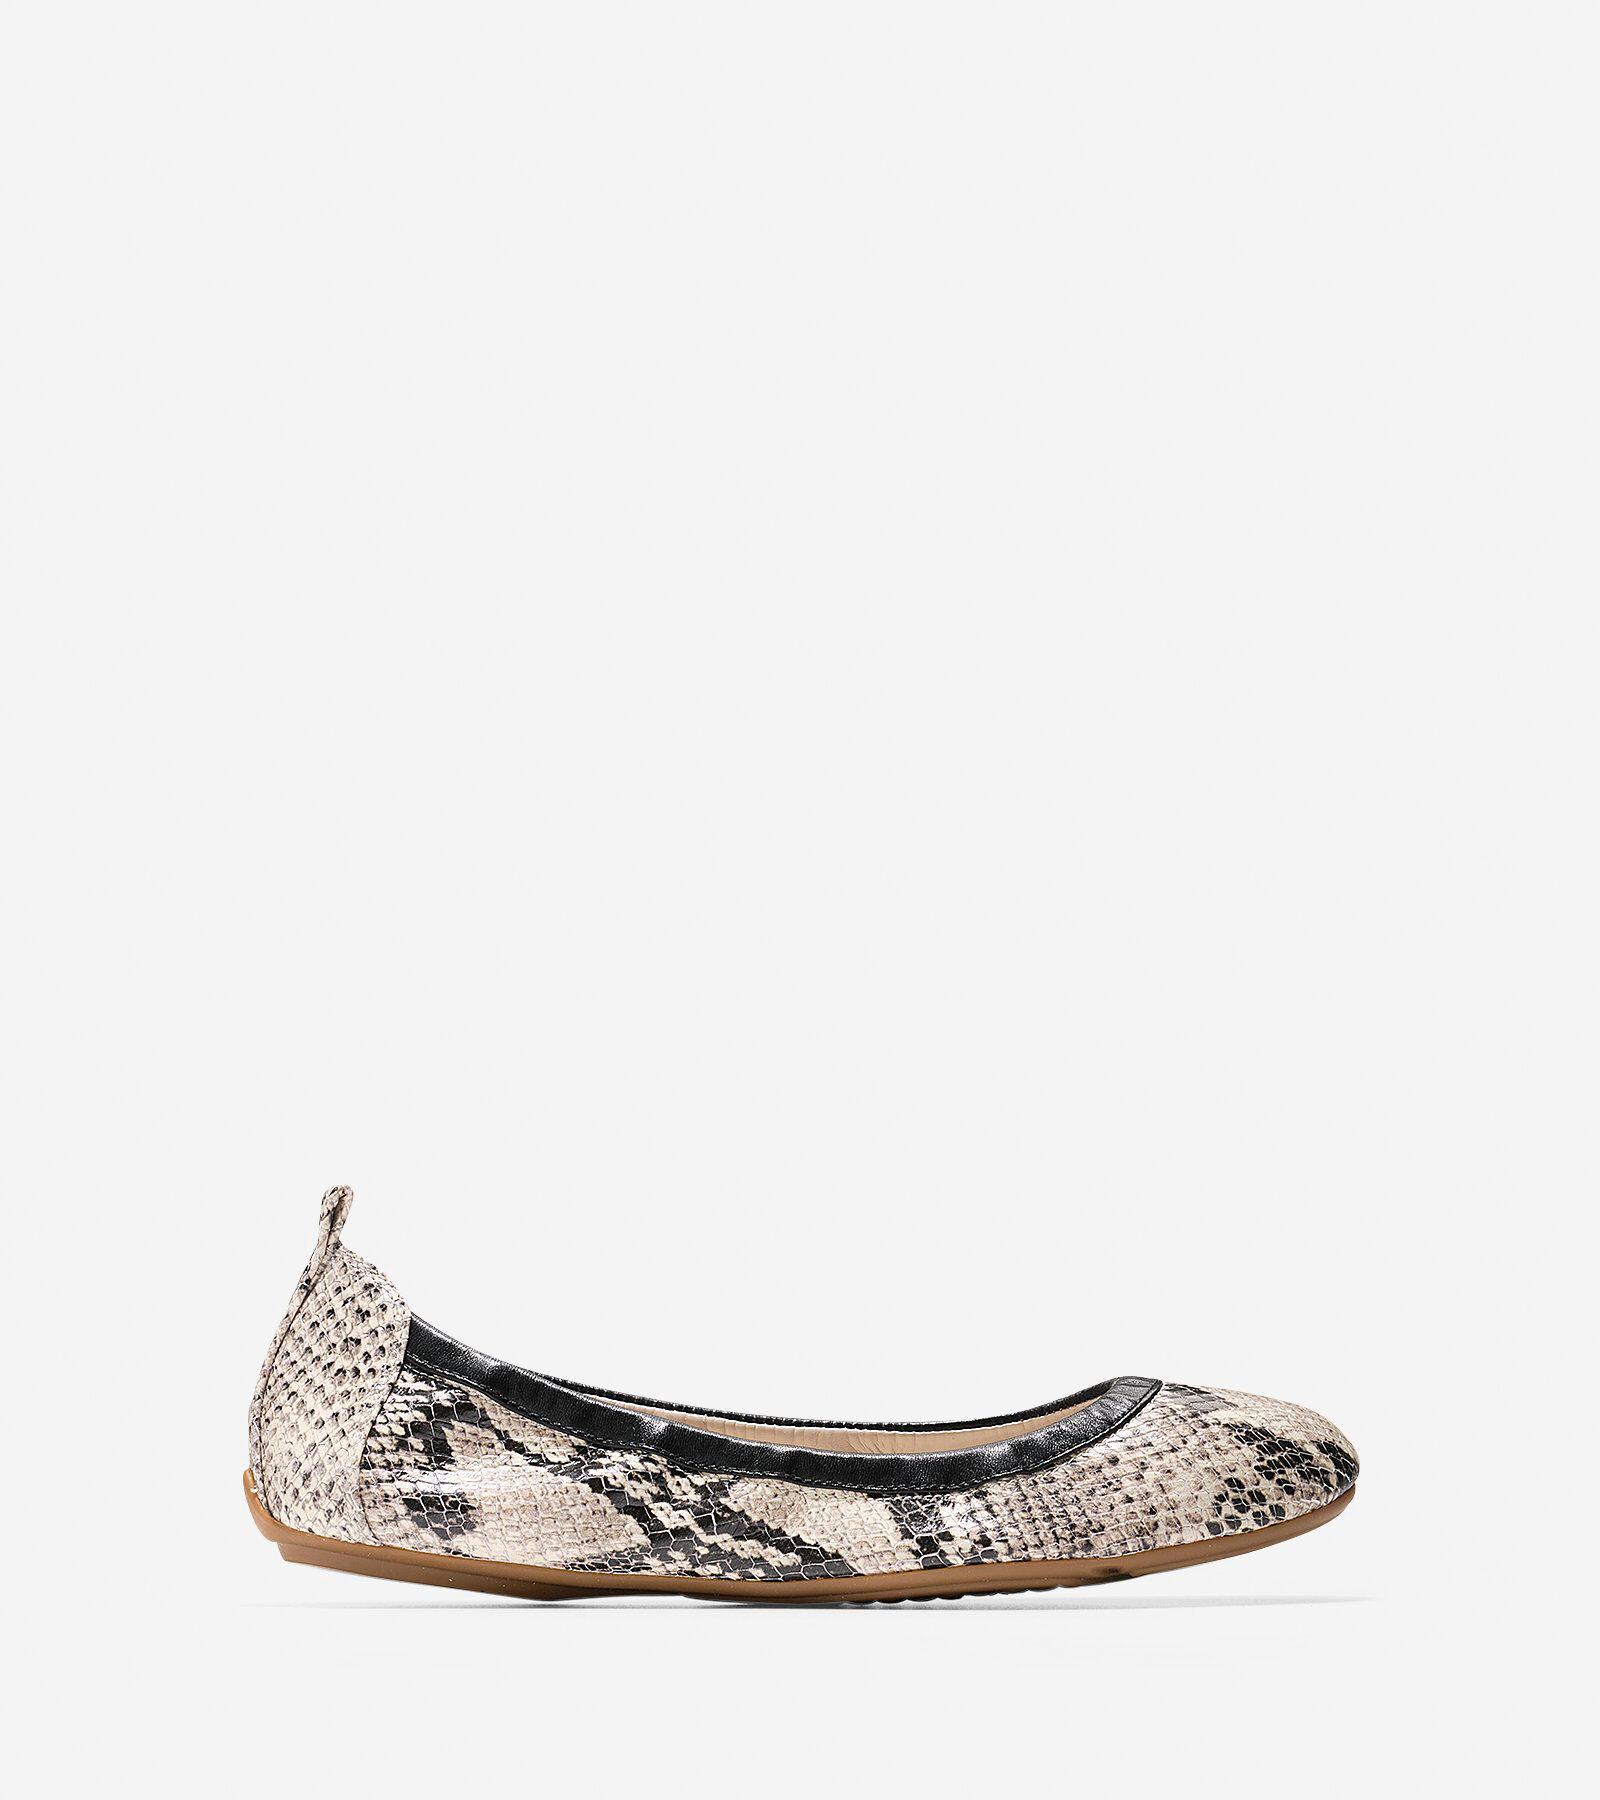 Womens Shoes Cole Haan Jenni Ballet II Roccia Snake Print